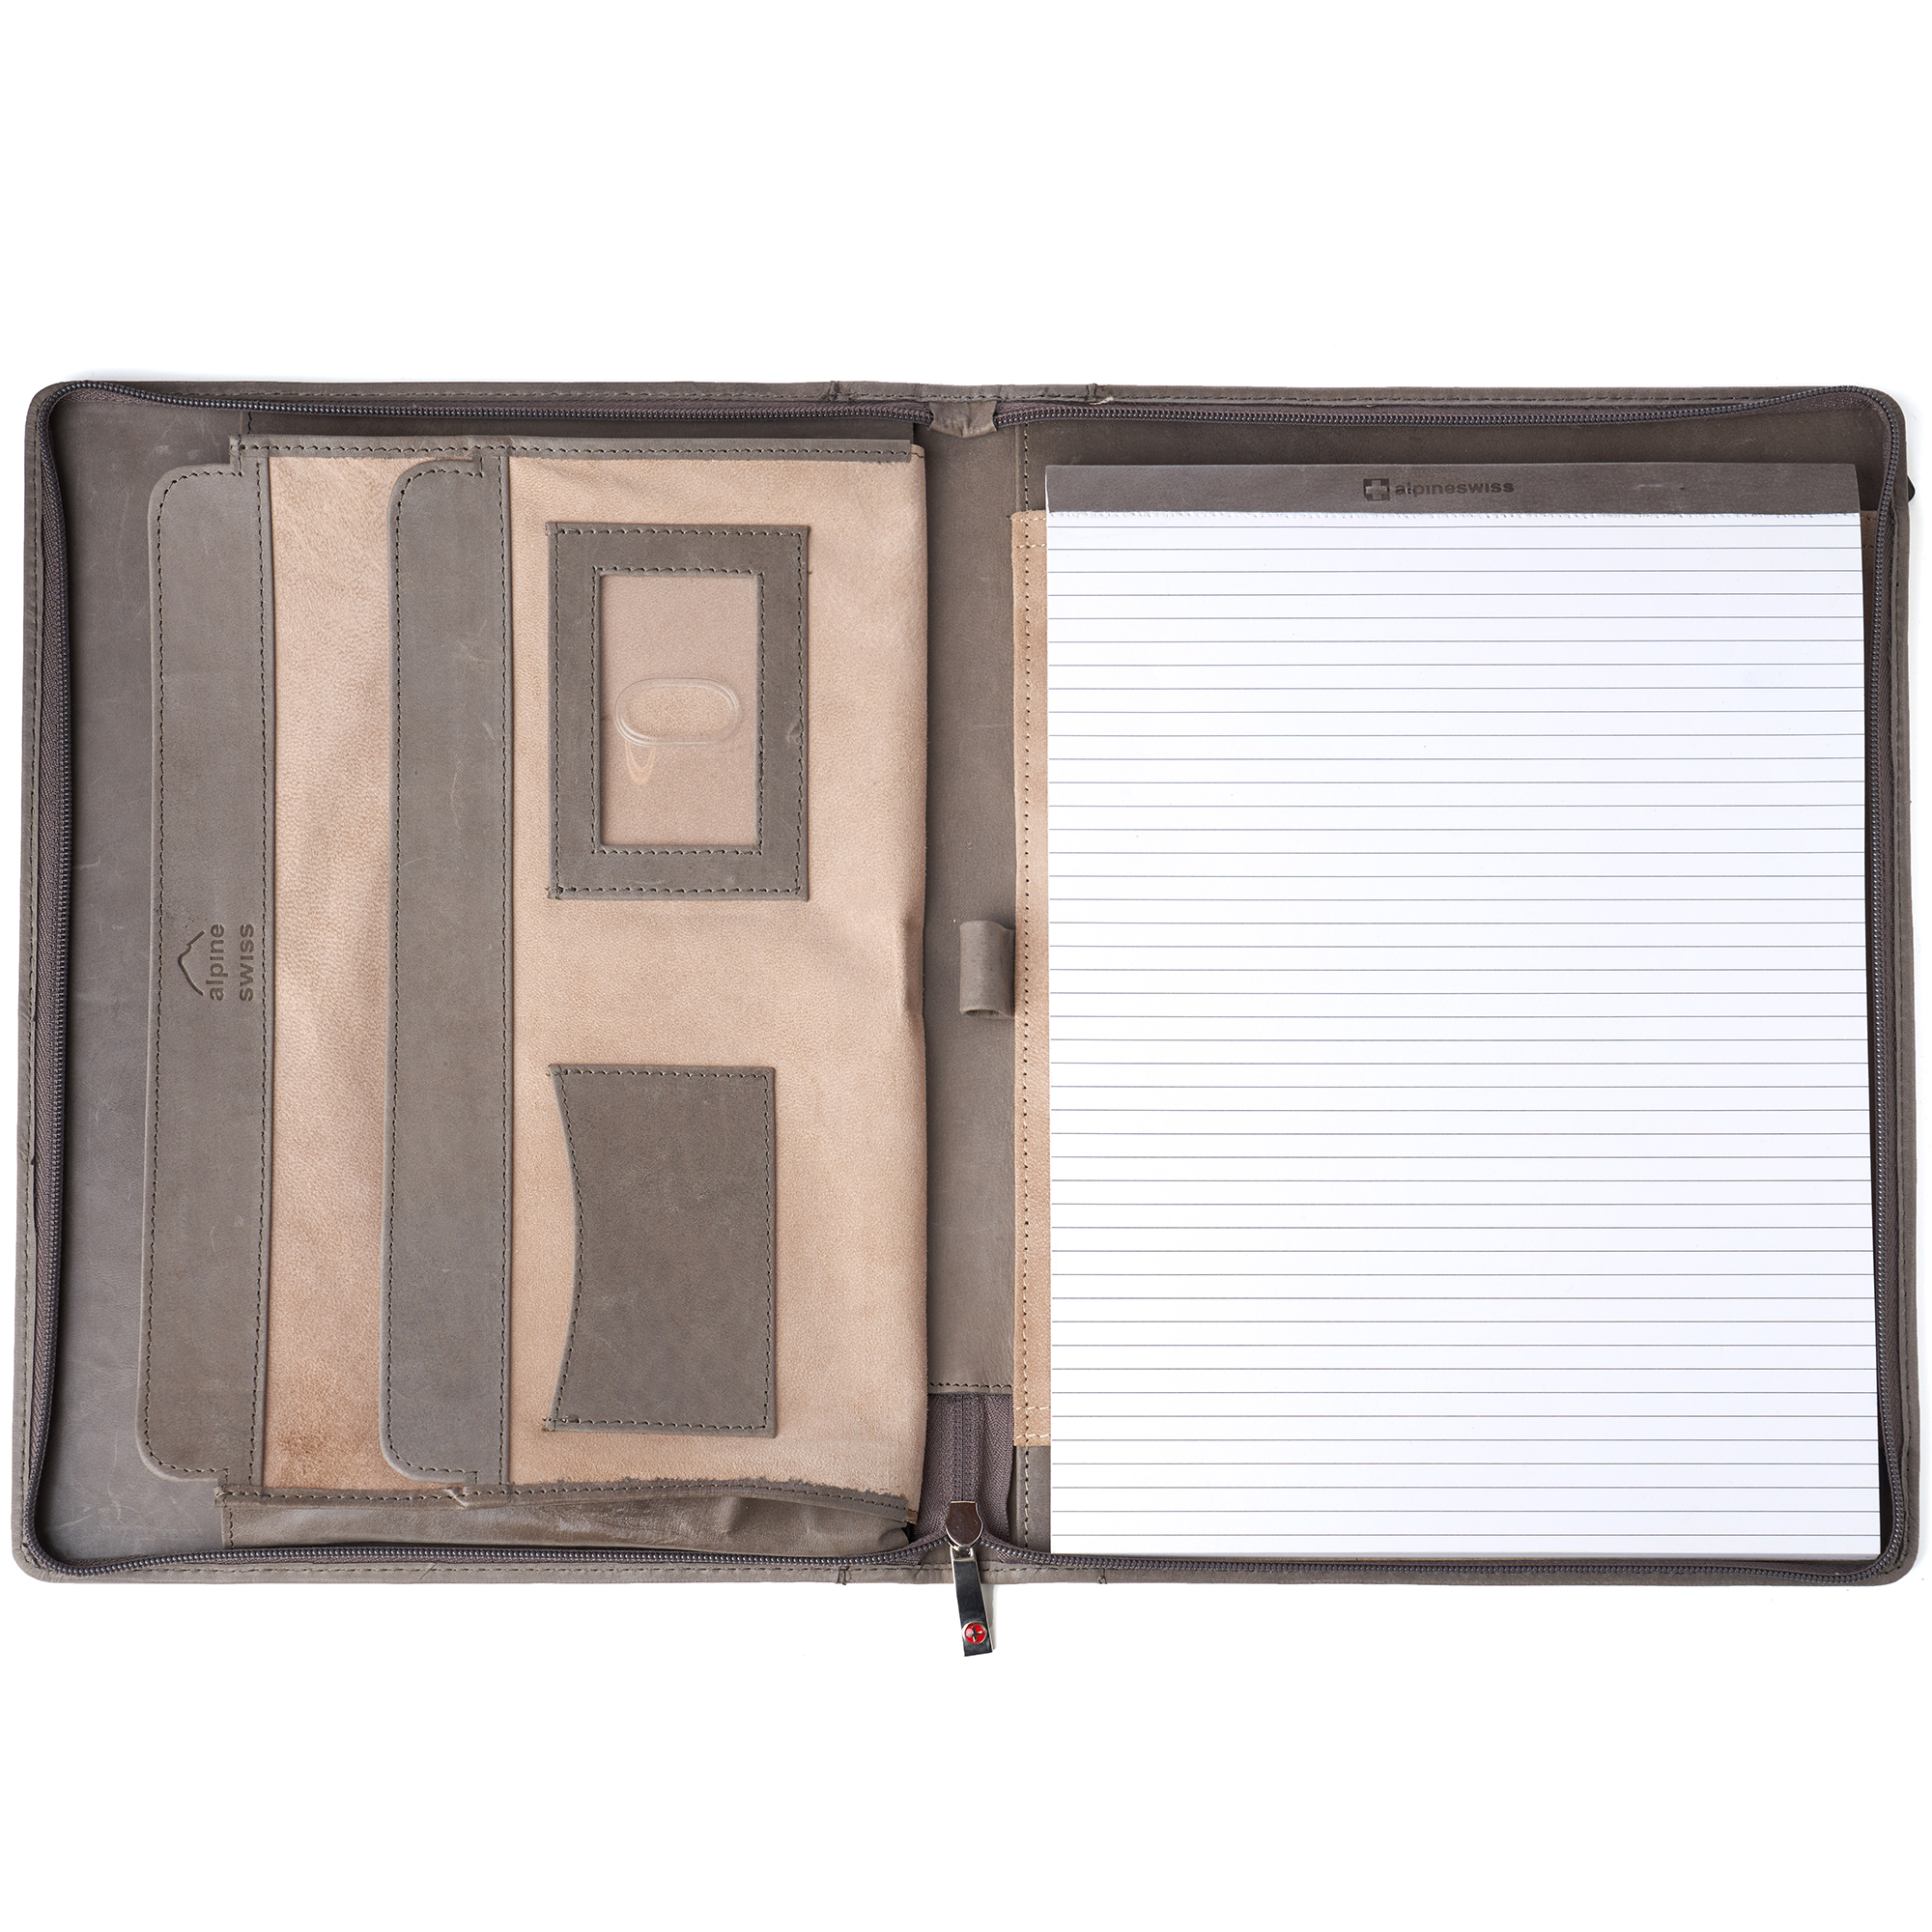 thumbnail 37 - Alpine Swiss Leather Zippered Writing Pad Portfolio Business Briefcase Organizer